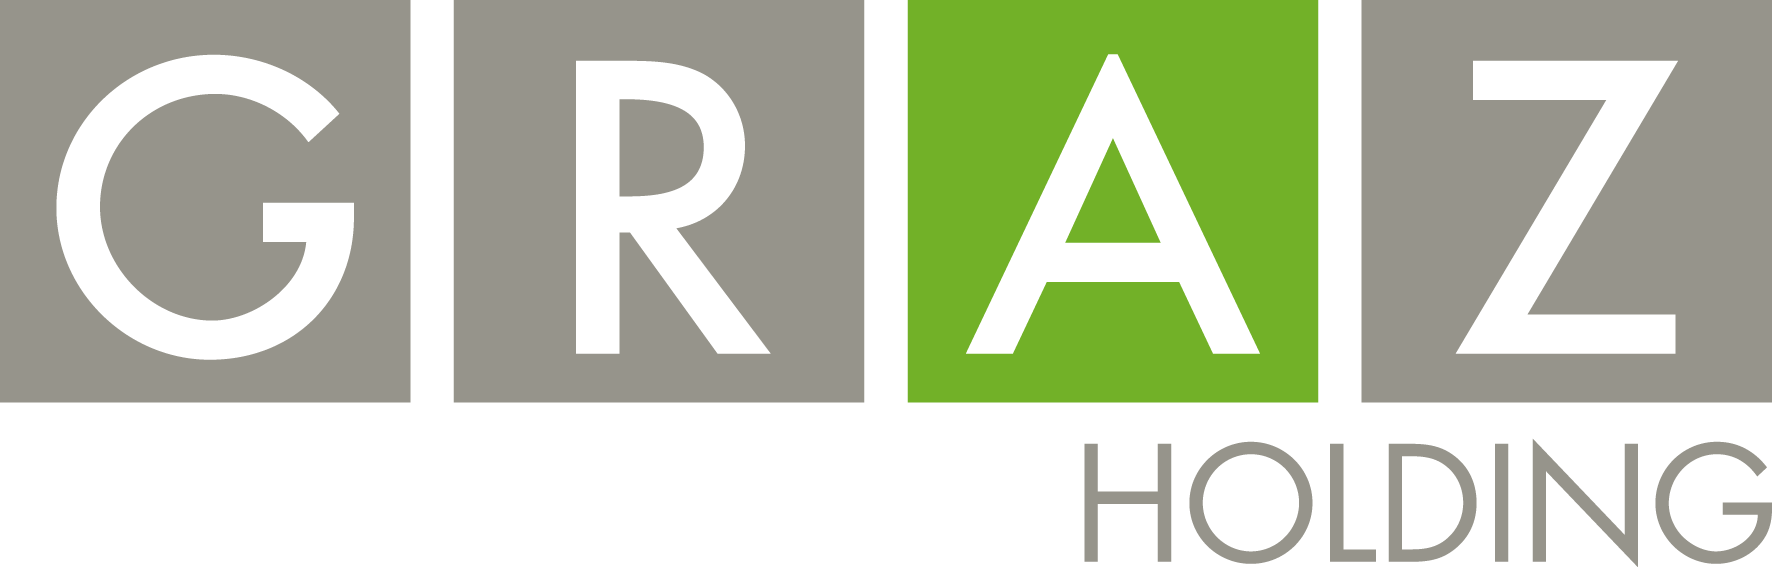 Holding Graz Logo